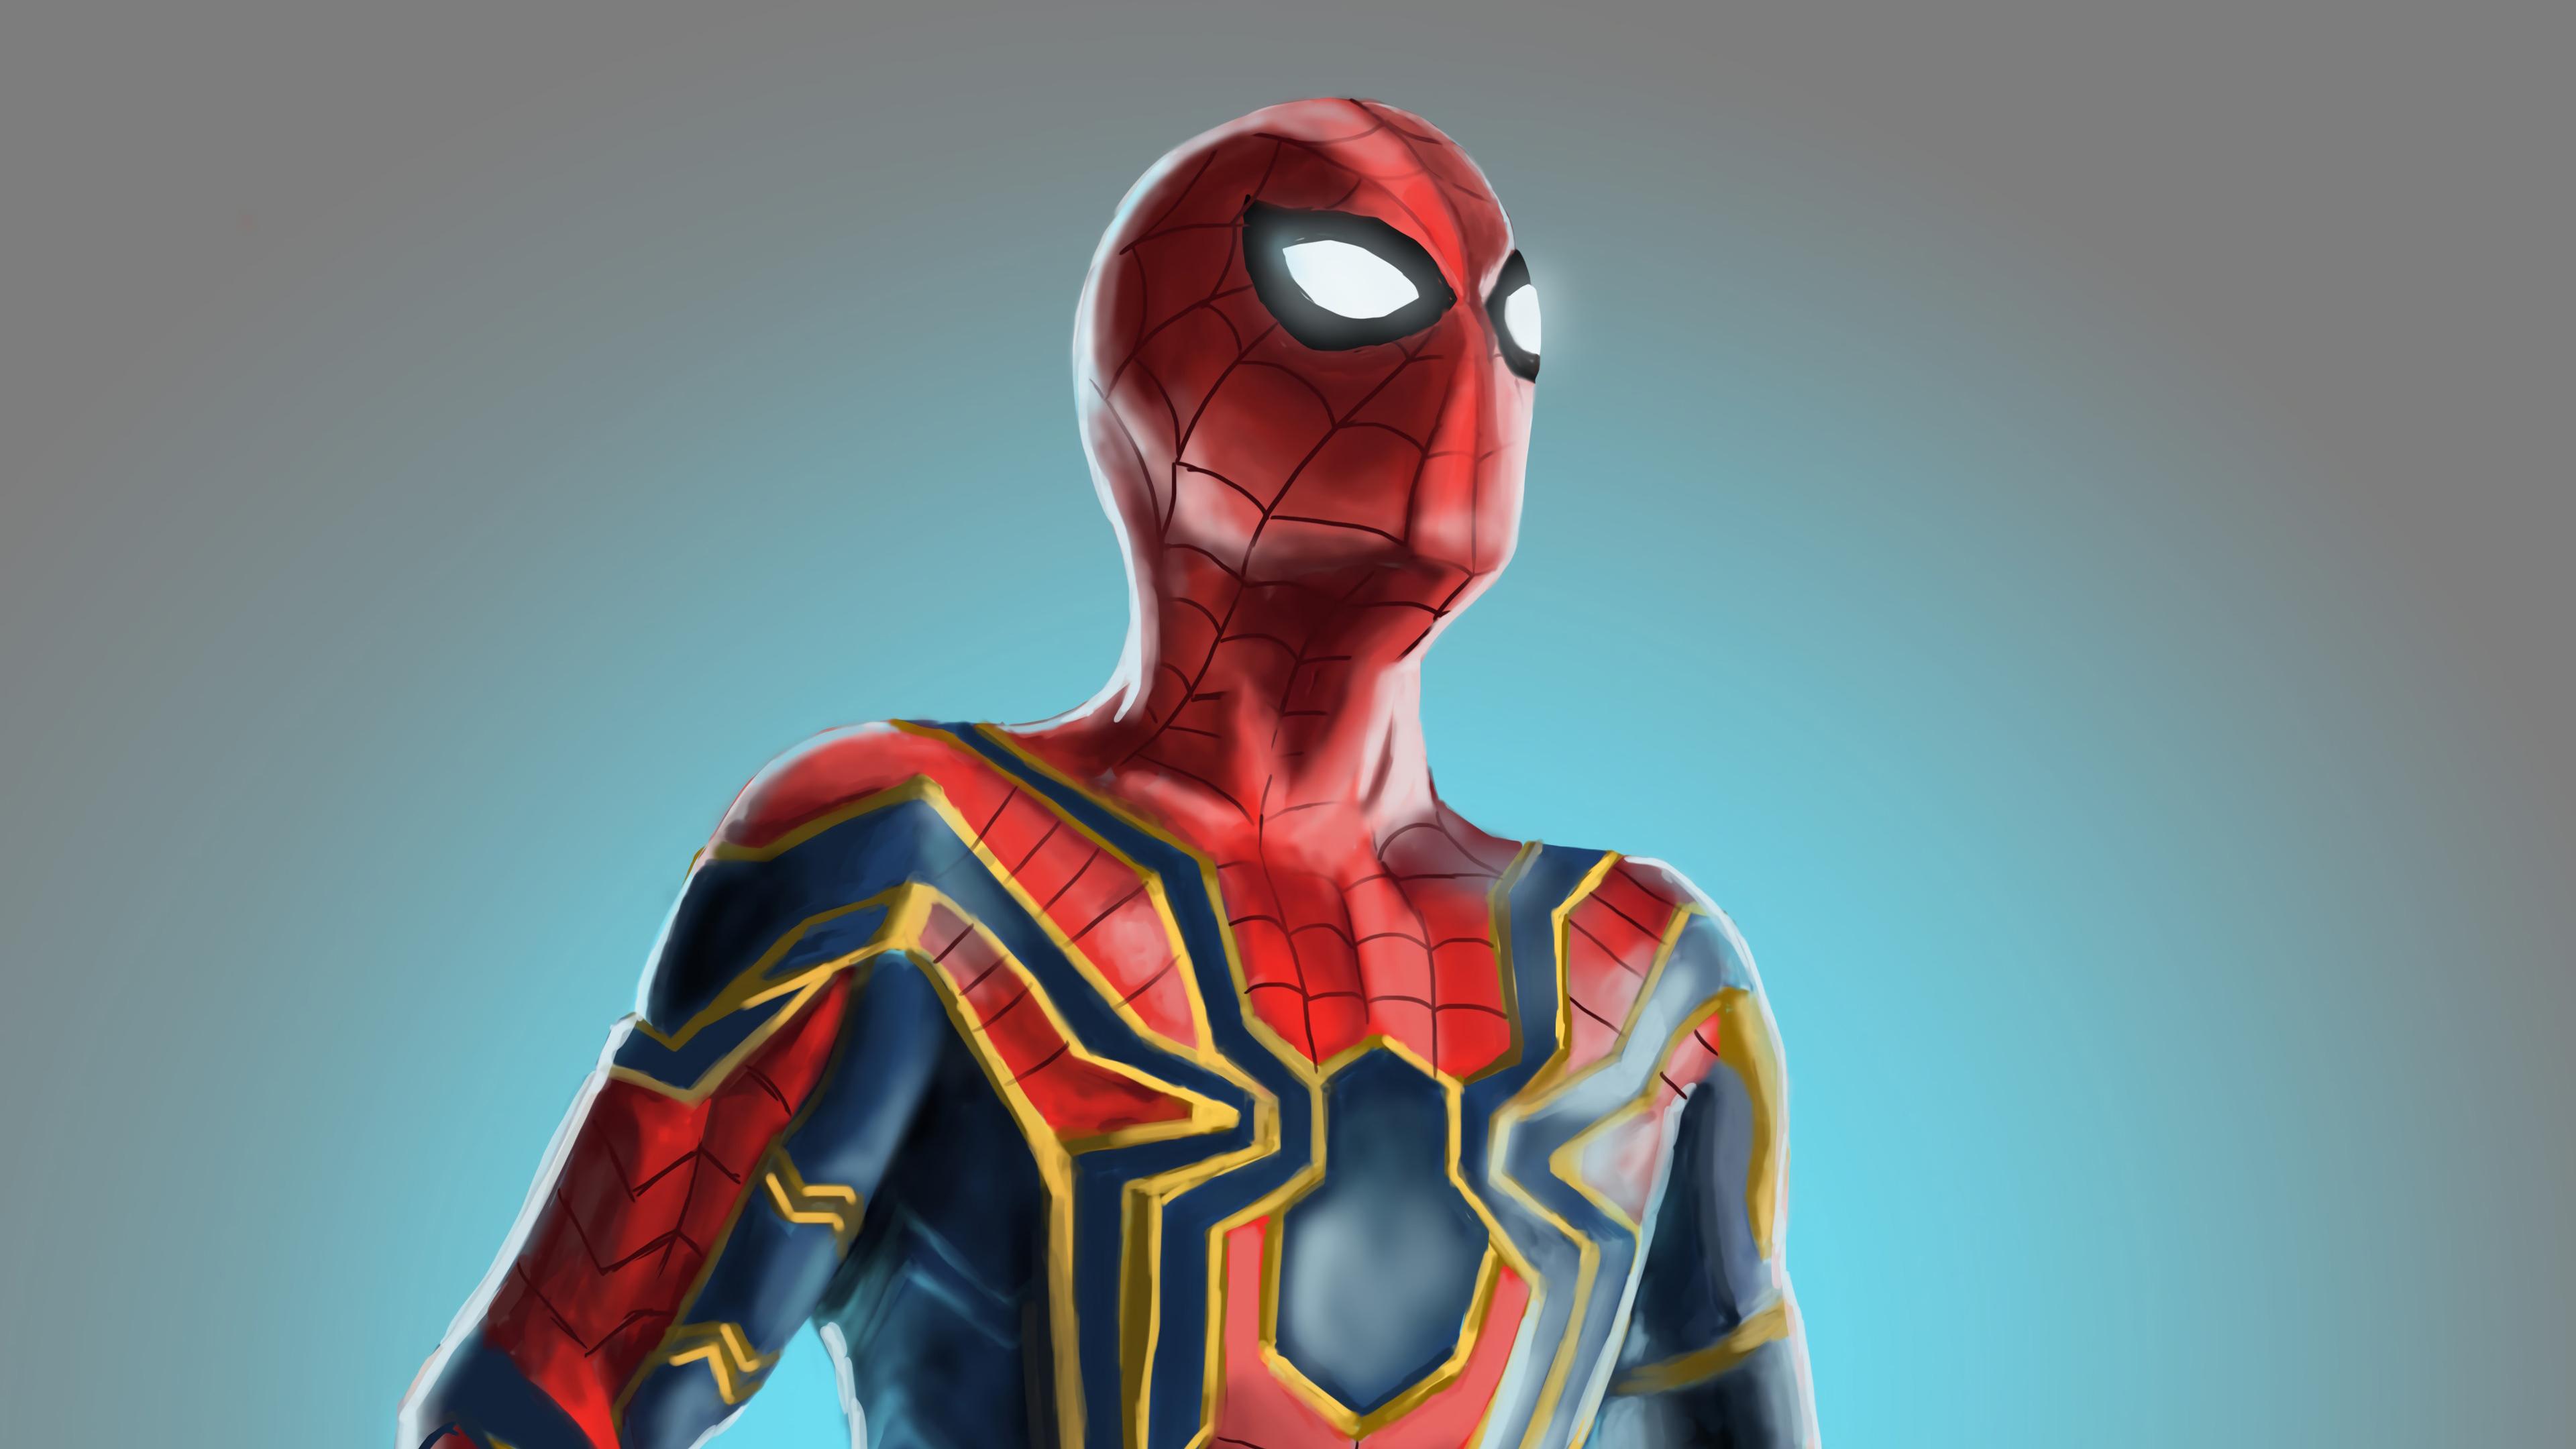 Wallpaper 4k Iron Spiderman 4k Wallpapers Art Wallpapers